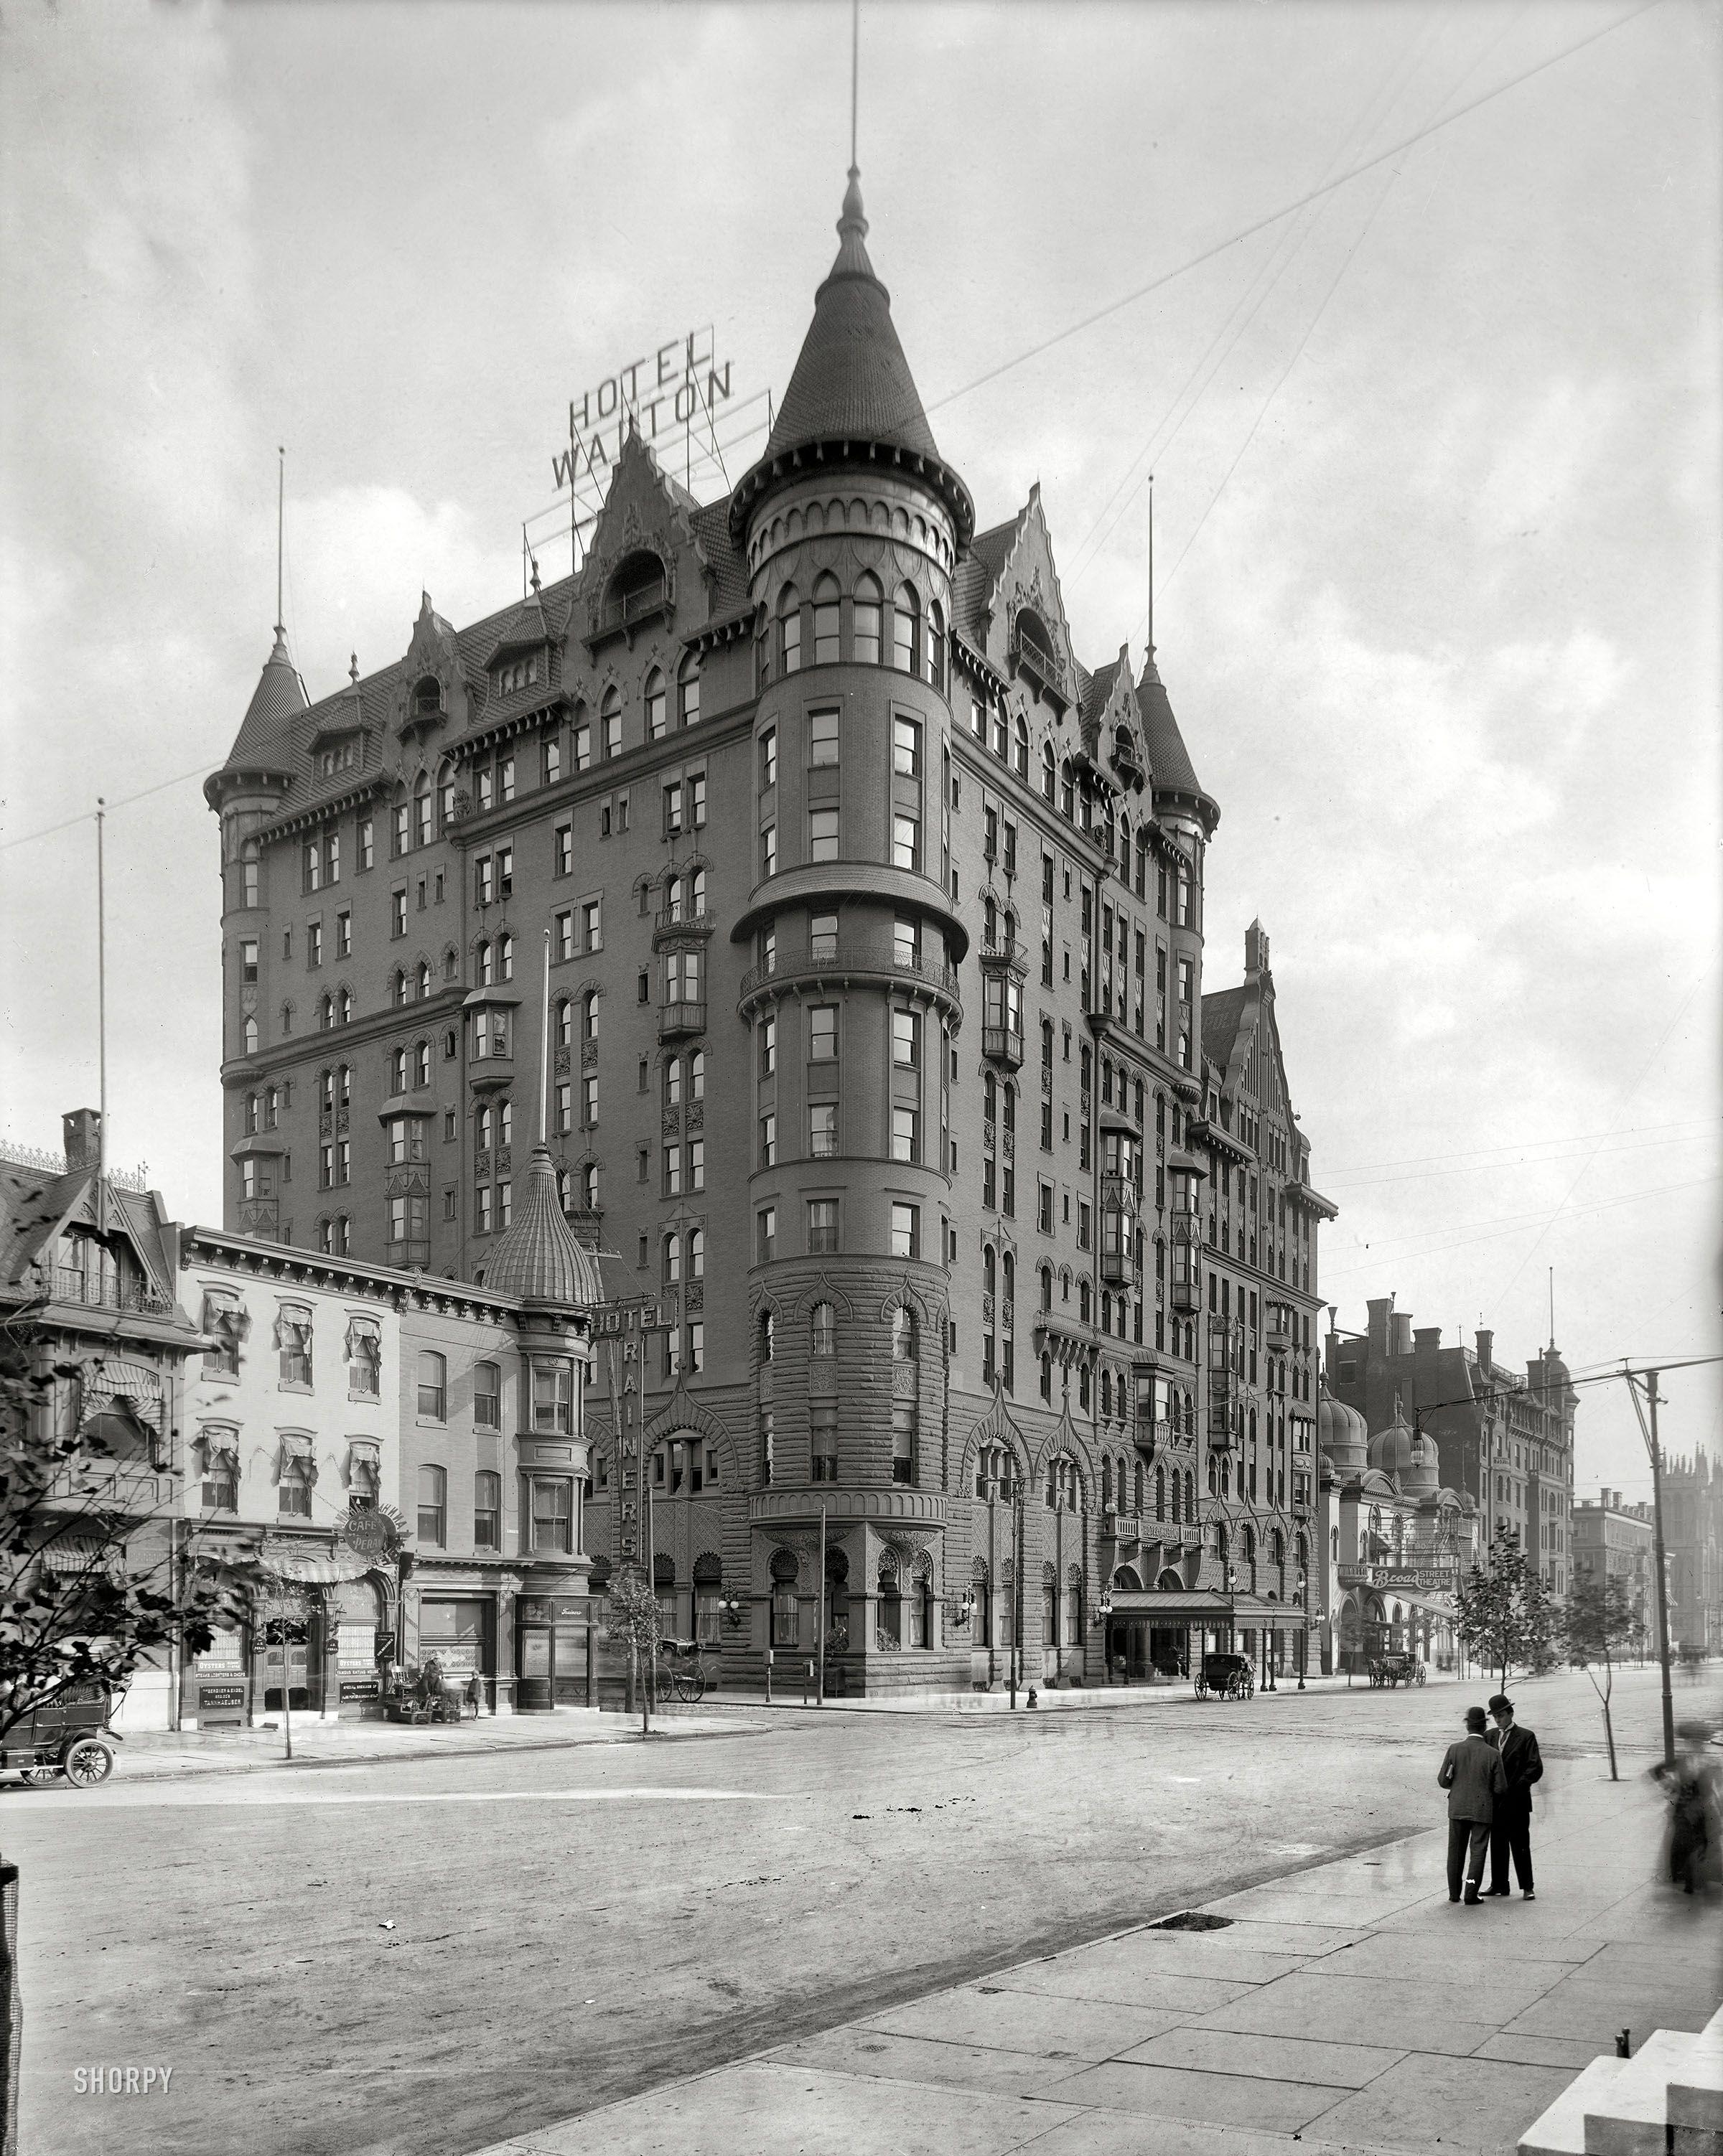 Shorpy Historical Photo Archive Hotel Walton Broad Street Philadelphia 1908